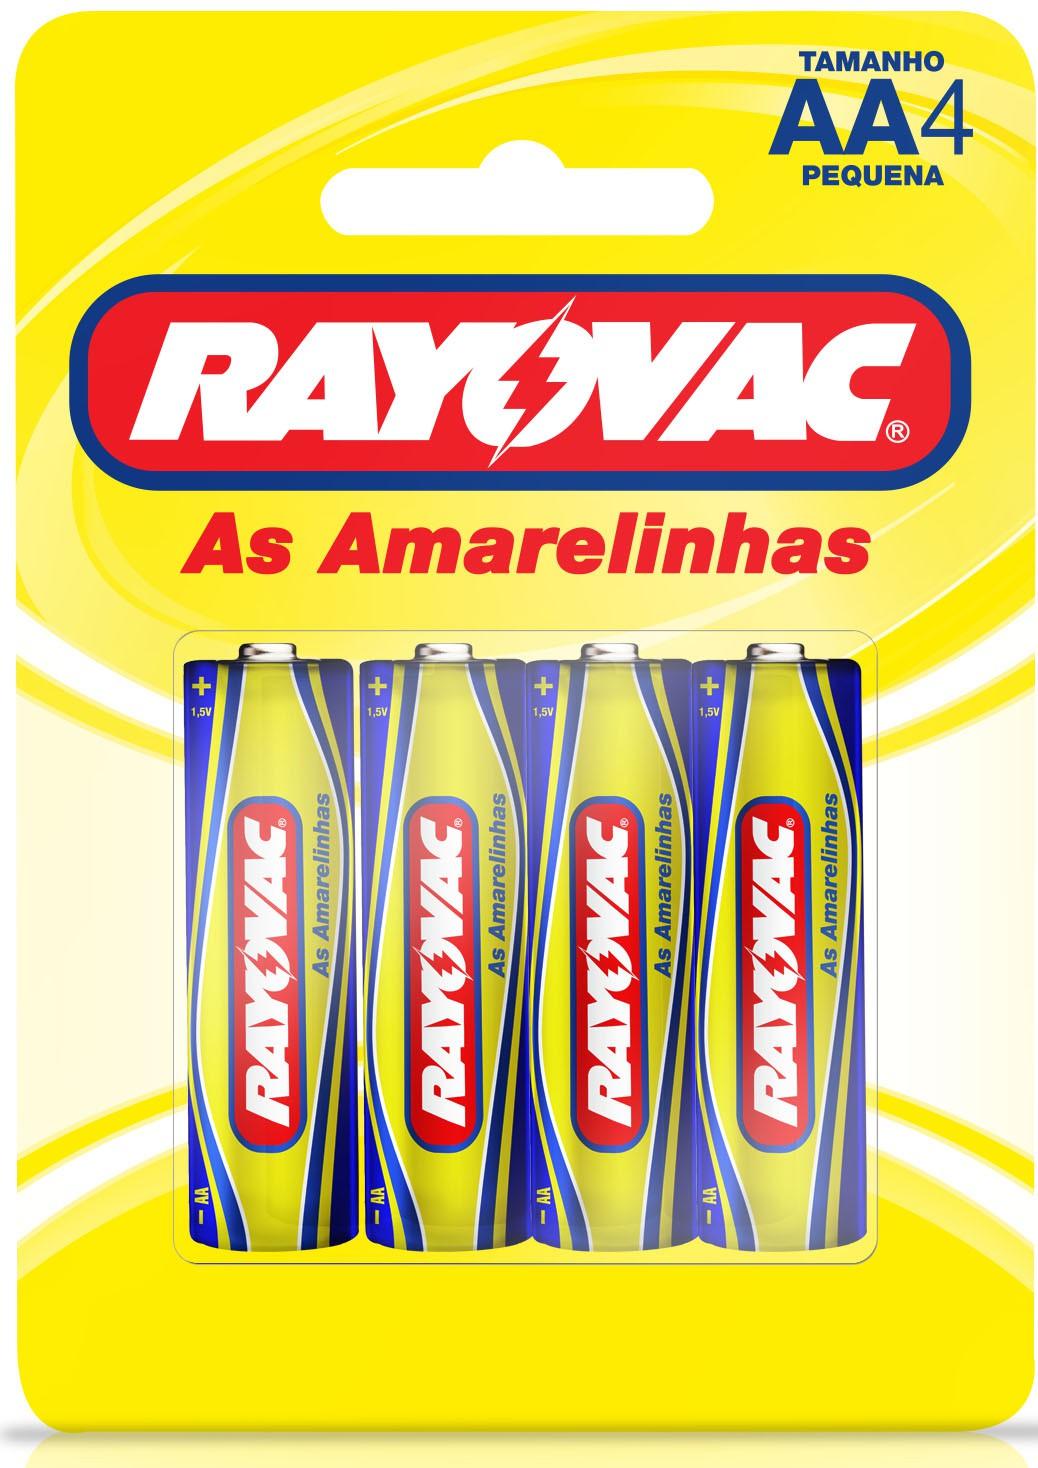 04 Pilhas AA Zinco Carvão RAYOVAC 1 cartela